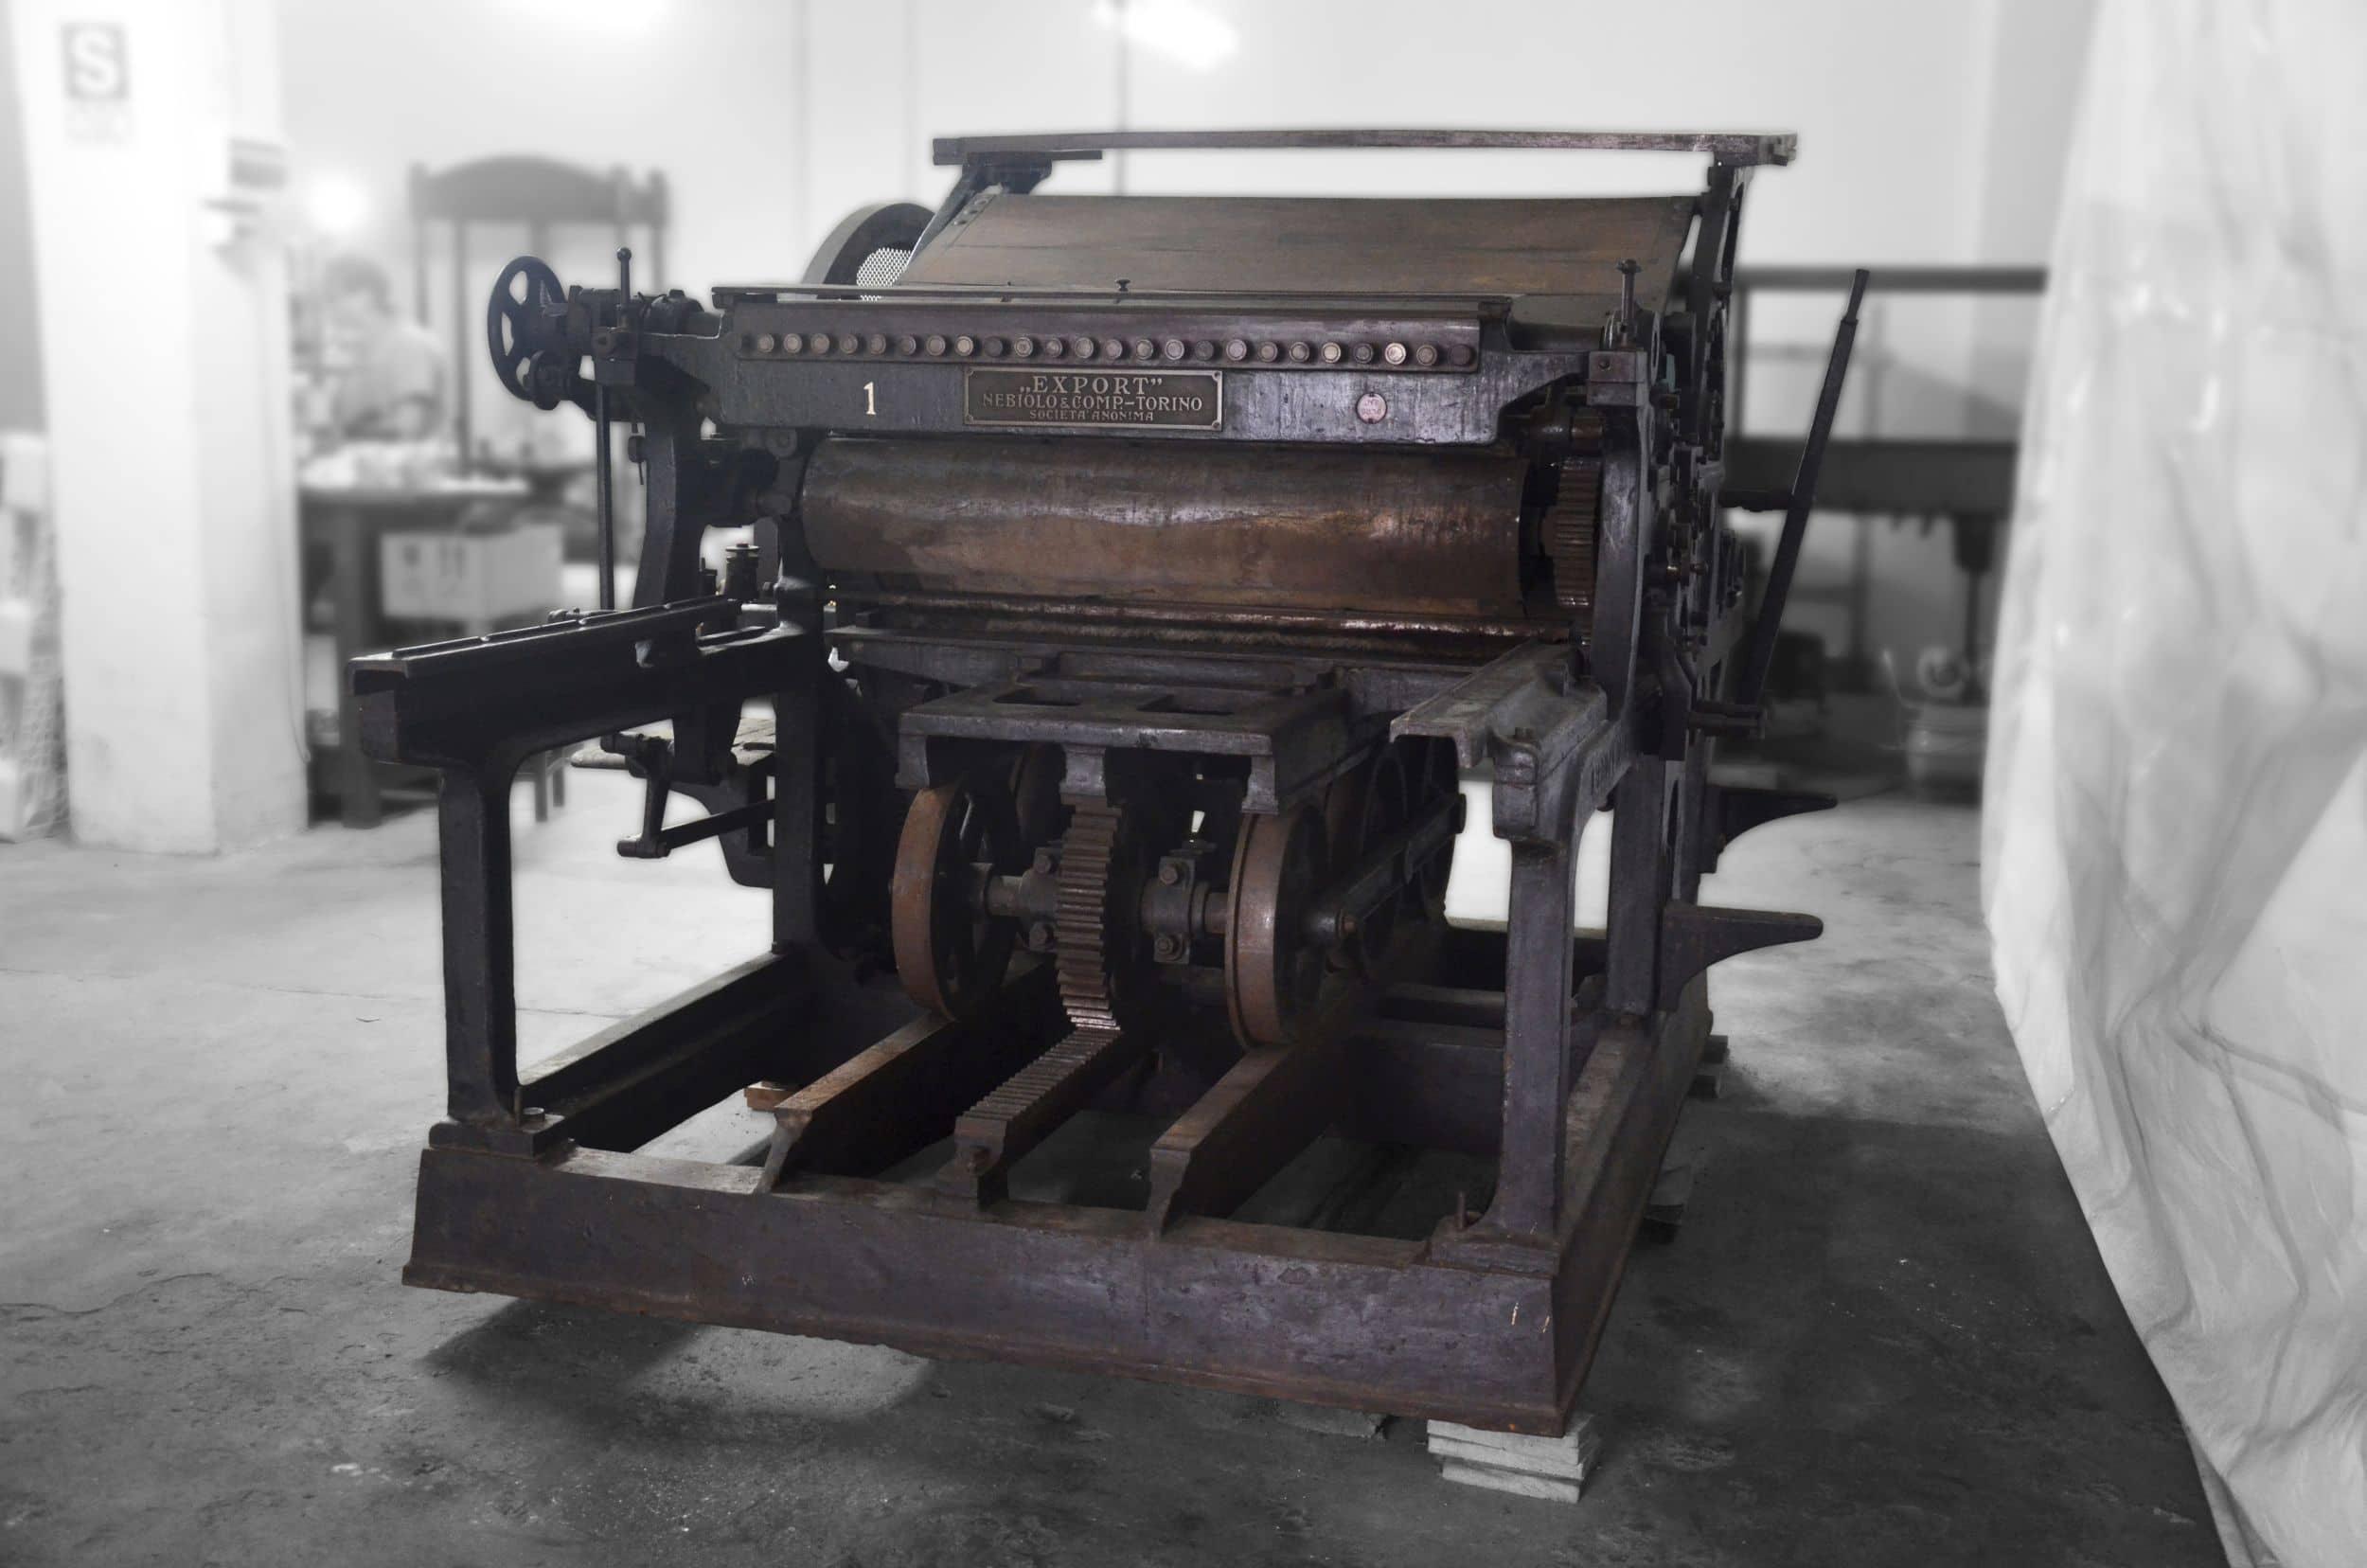 Historia de la imprenta-Imprenta en Perú